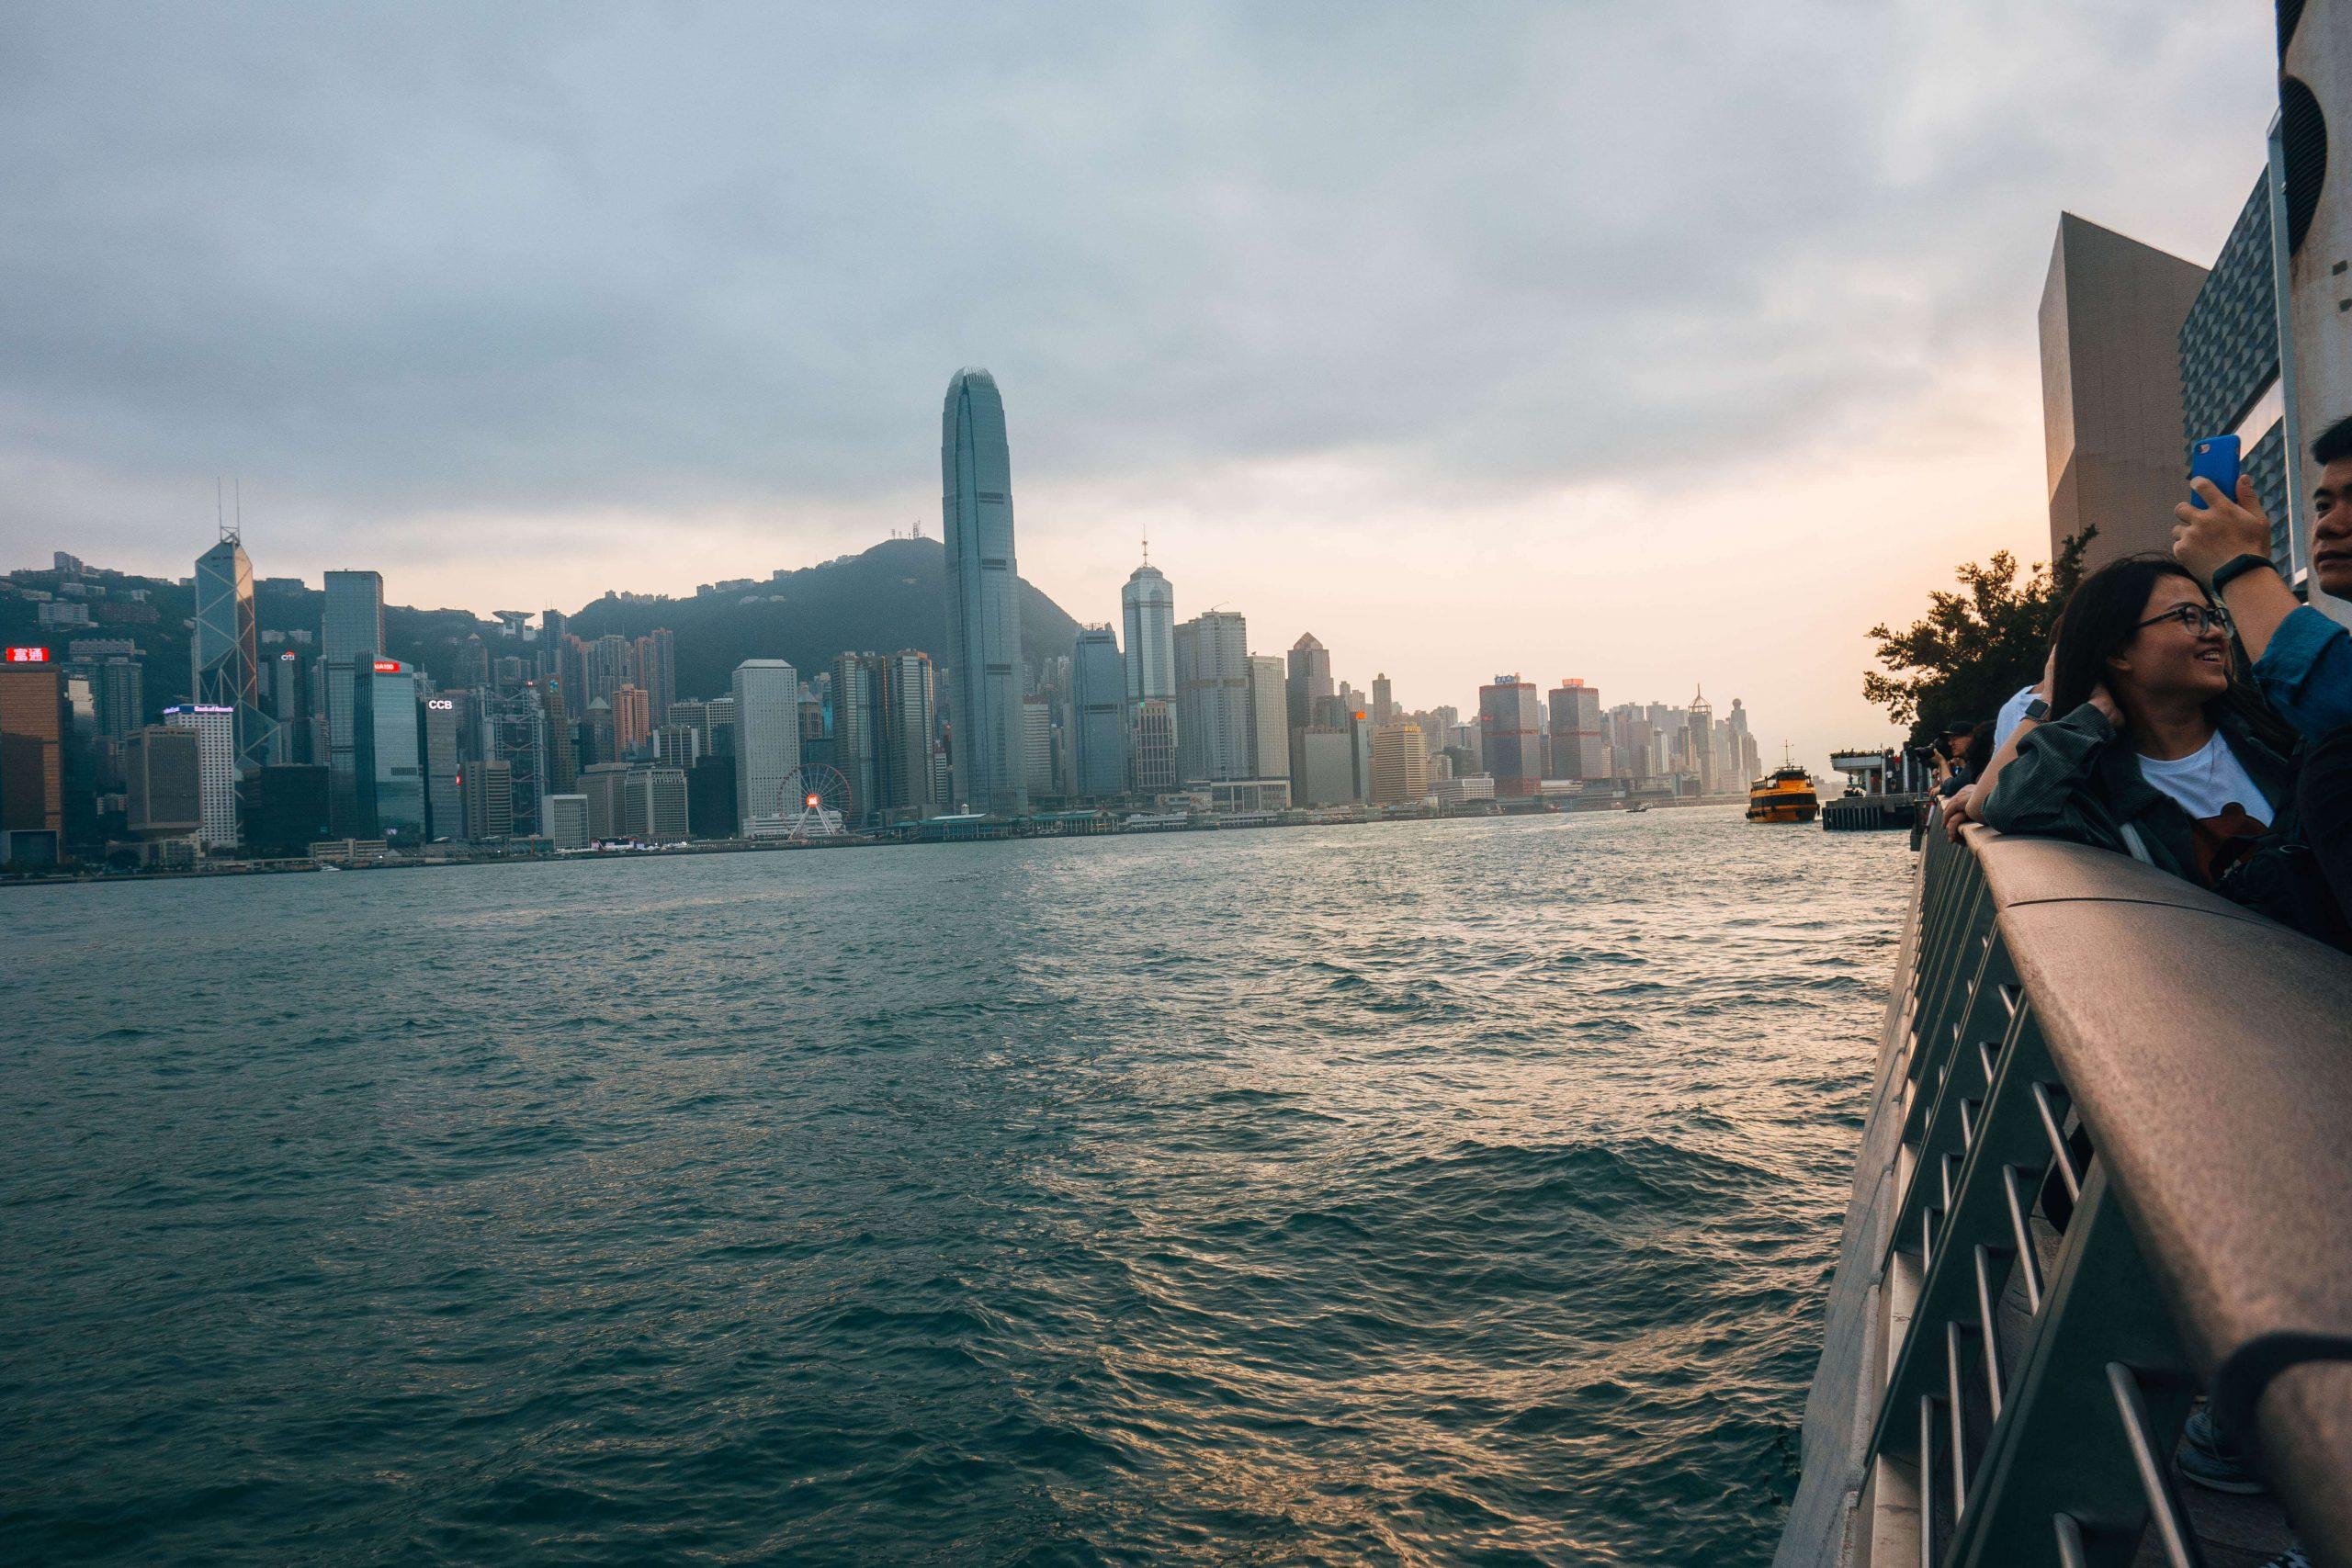 Tsm Sha Tsui/ Victoria Harbour view Hong Kong